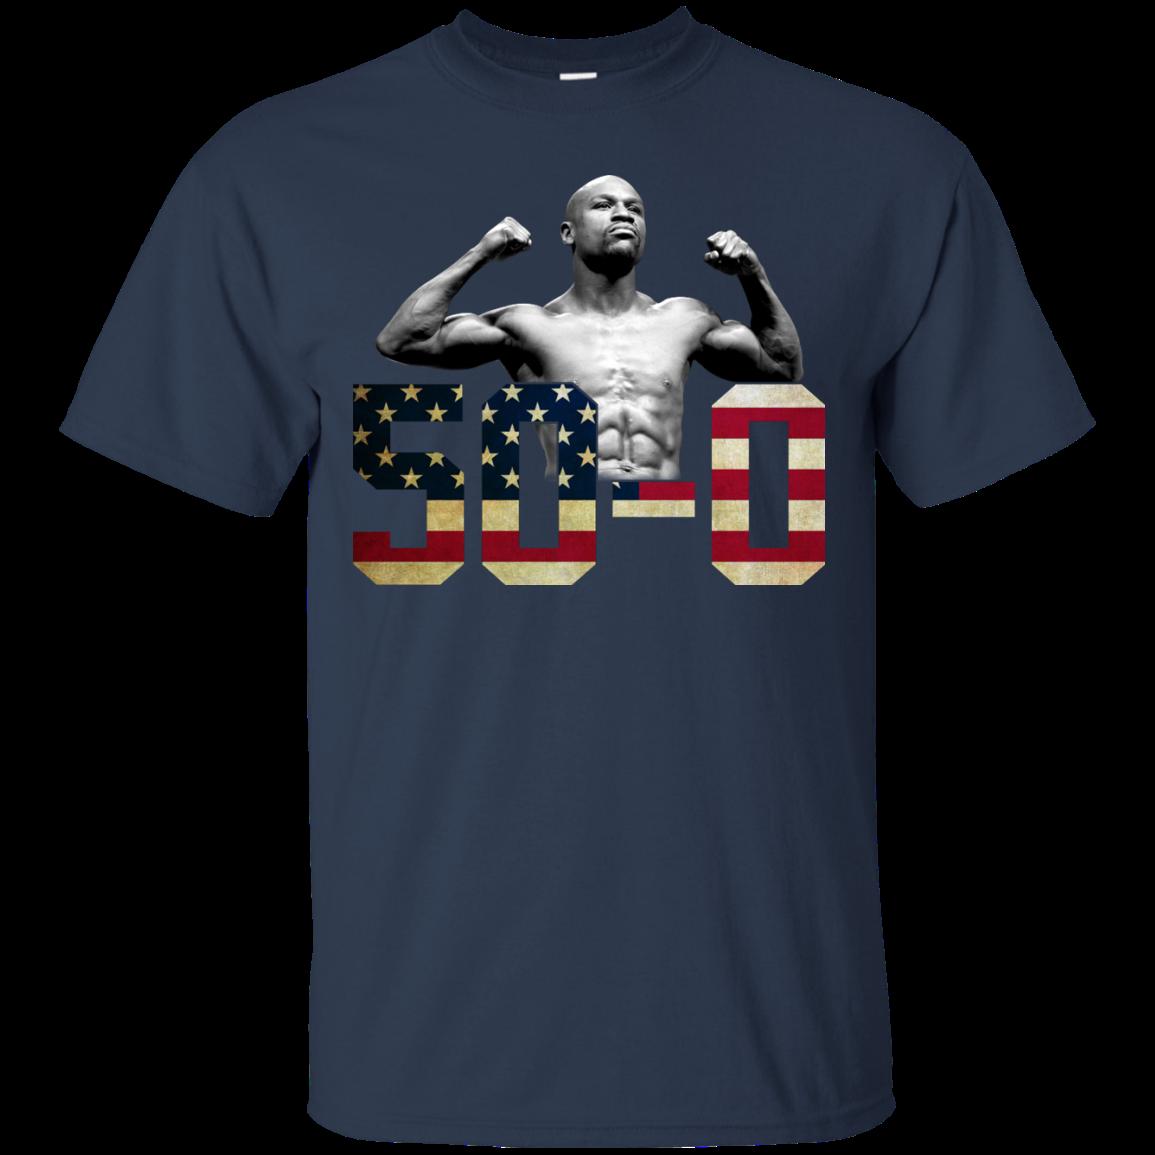 image 503px Floyd Mayweather 50 0 Shirt, Hoodies, Tank